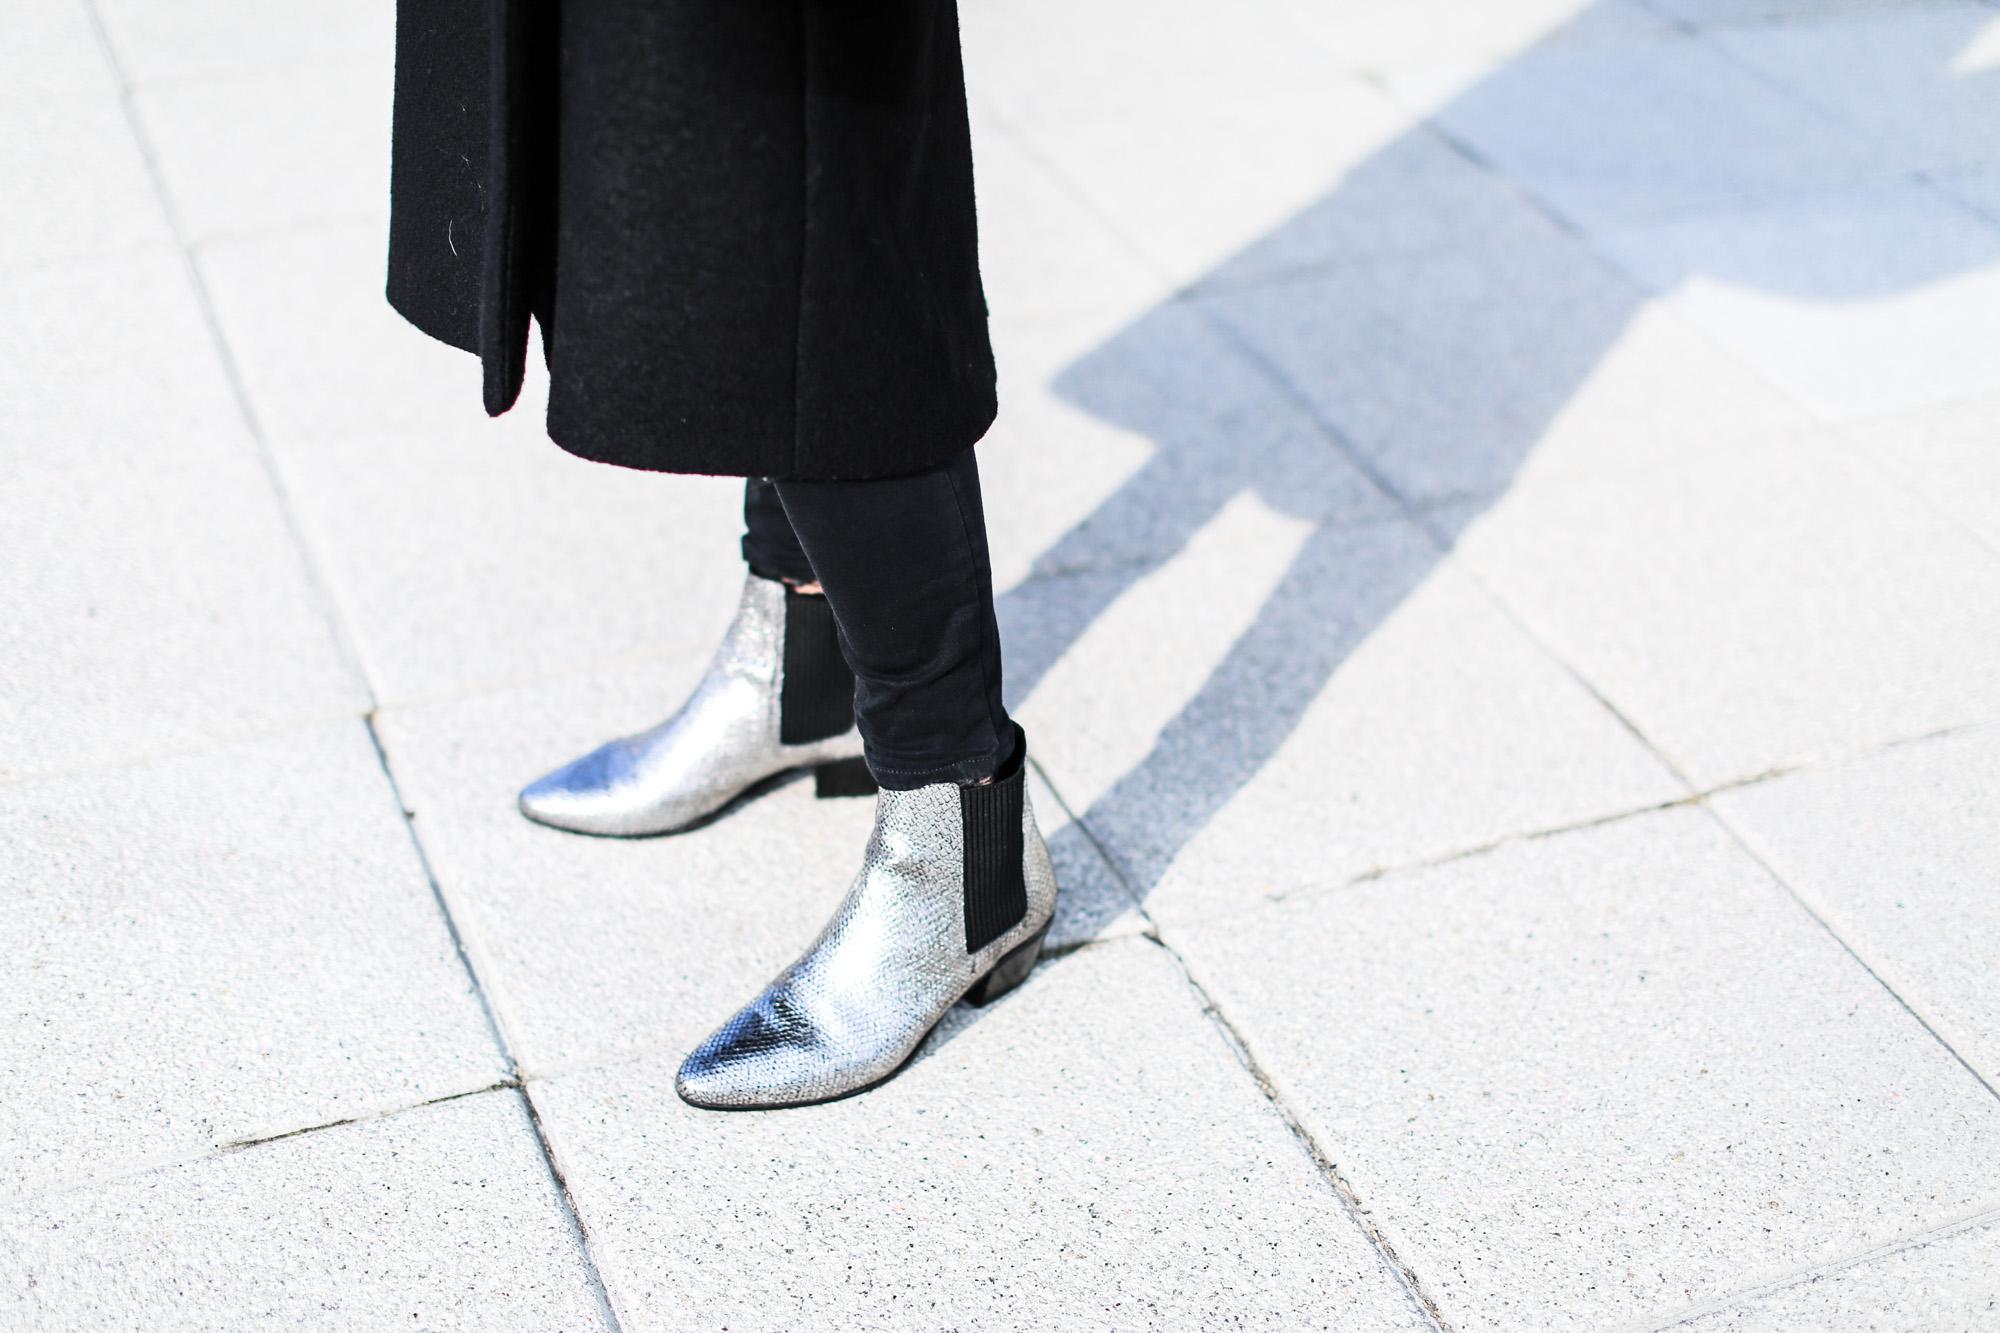 Clochet_streetstyle_fashionblogger_josefinabags_cosabrigolargolana_botinespielplateadosMaje_bufandaAcneStudiosCanada-3